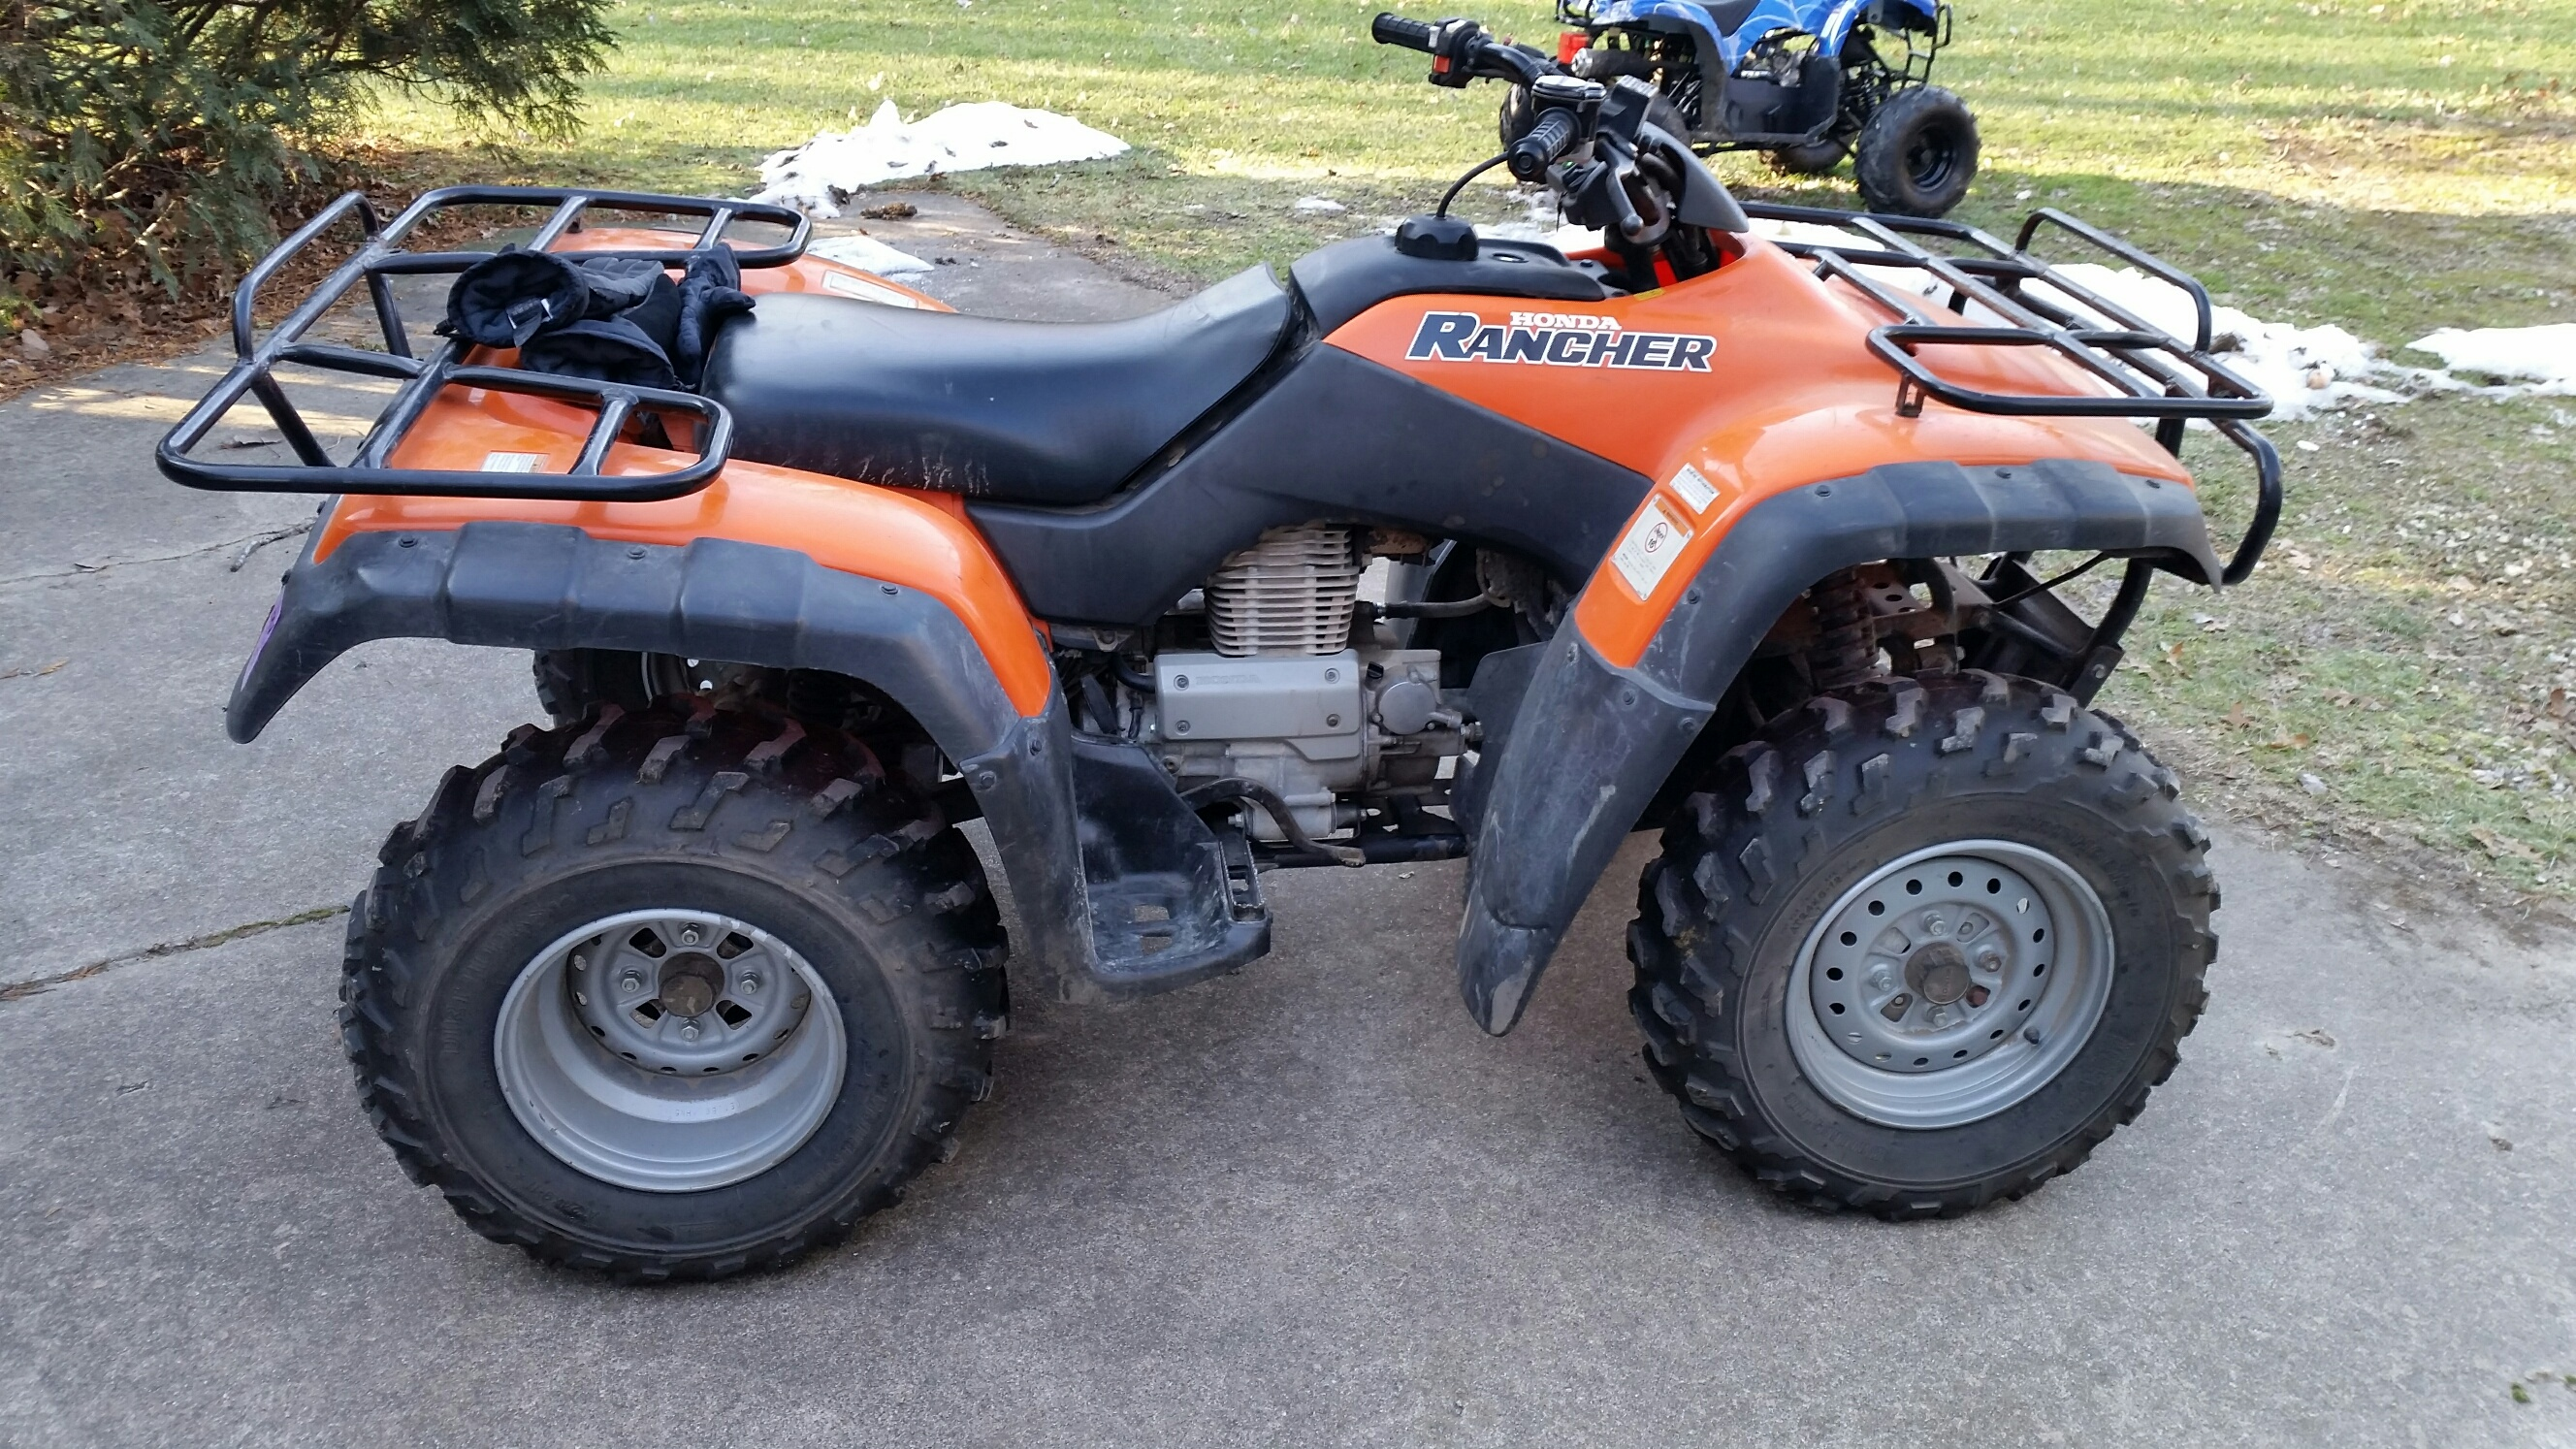 Honda Rancher For Sale >> 2001 Honda Rancher 4x4 FM1 - Michigan $1400 - Honda ATV Forum